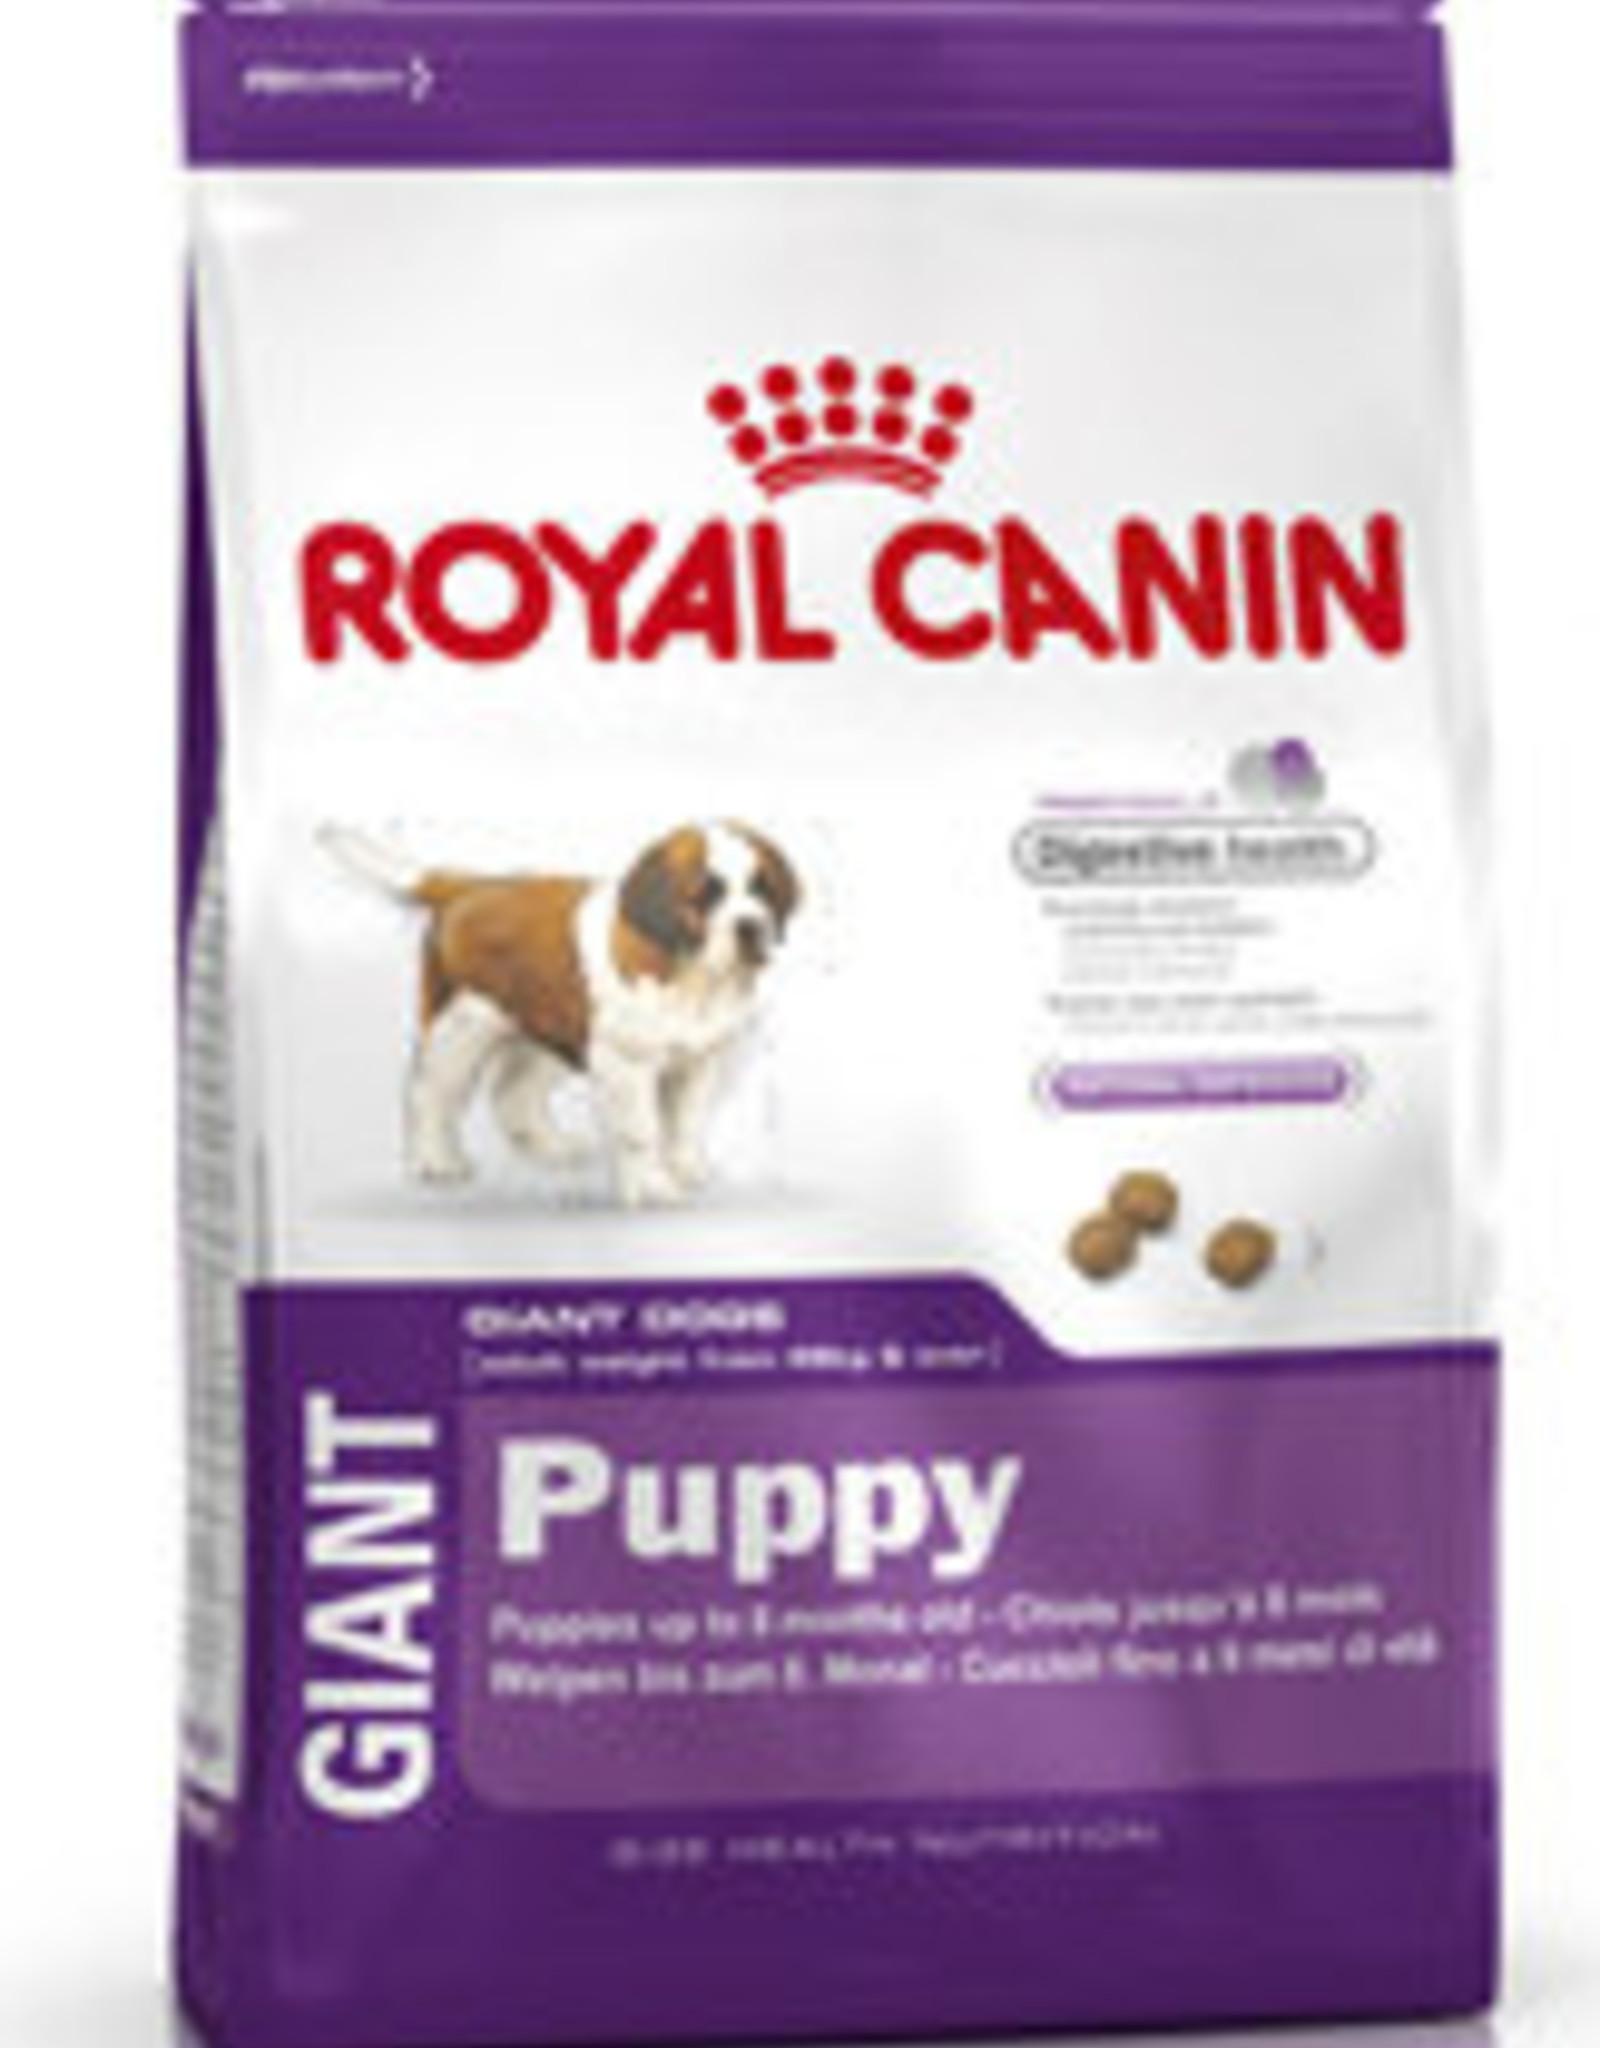 Royal Canin Royal Canin Shn Giant Puppy 4kg